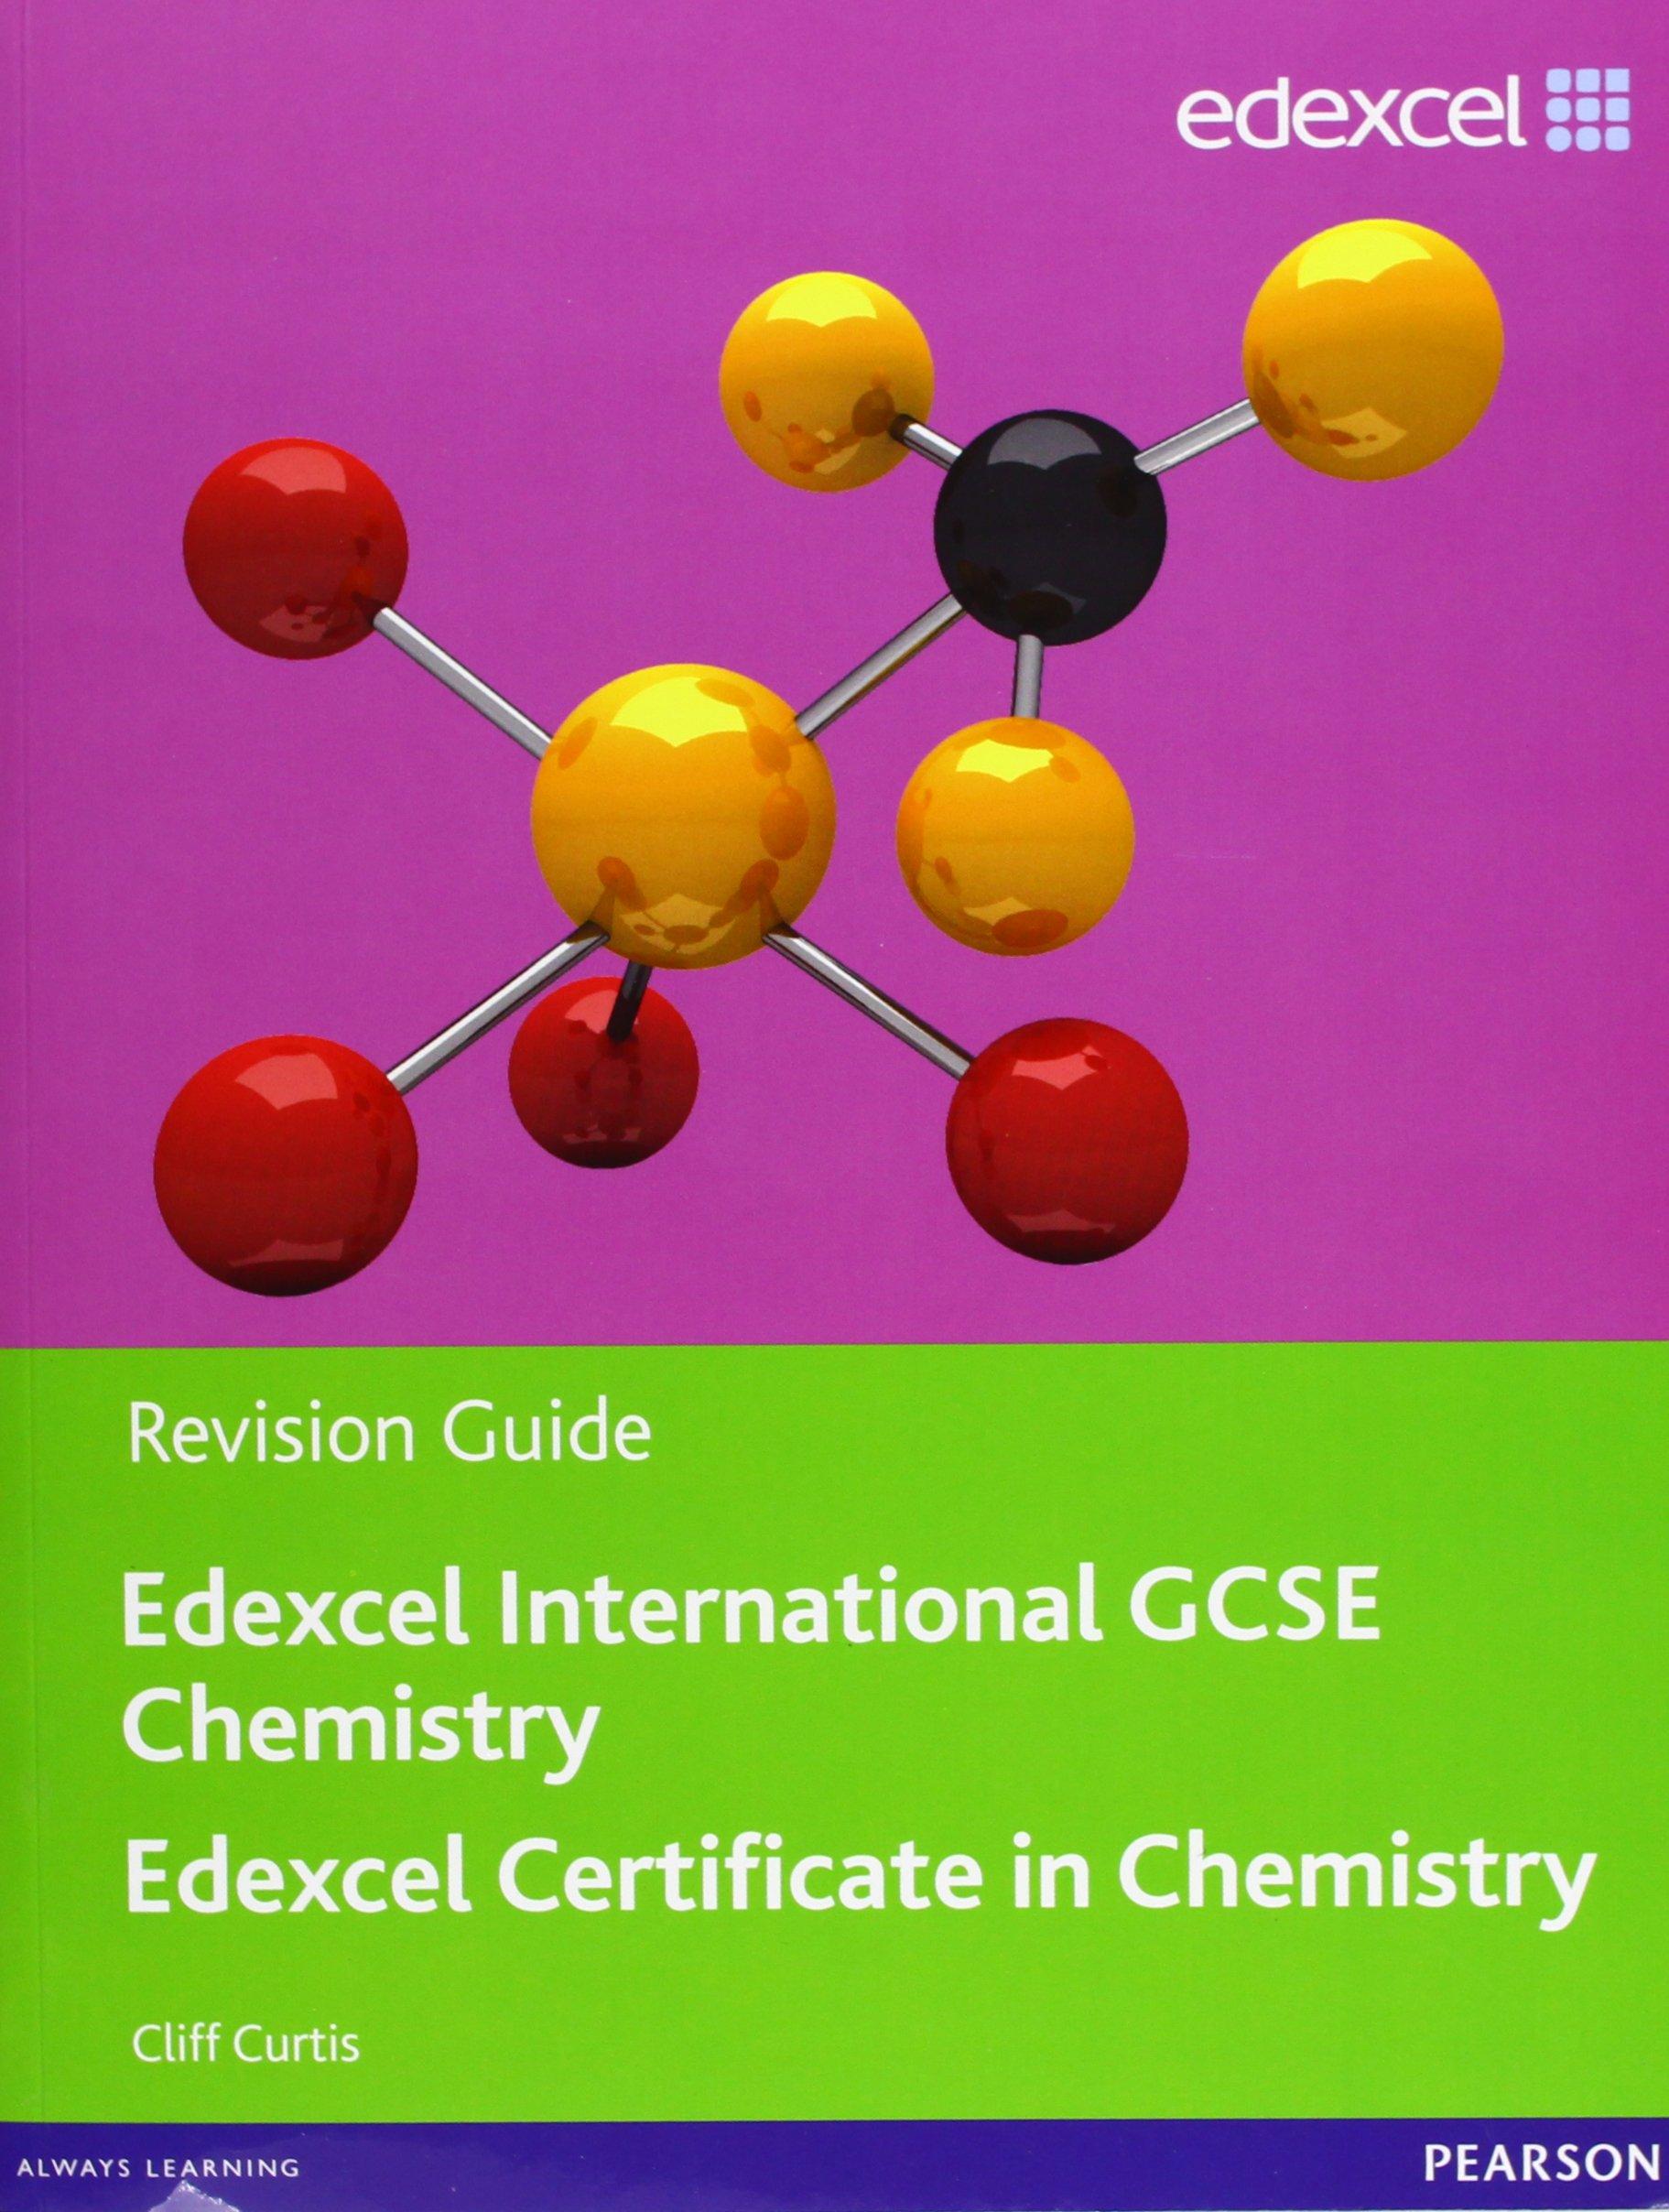 Edexcel Igcse Chemistry. Revision Guide (Edexcel International GCSE): Cliff  Curtis: 9780435046729: Amazon.com: Books